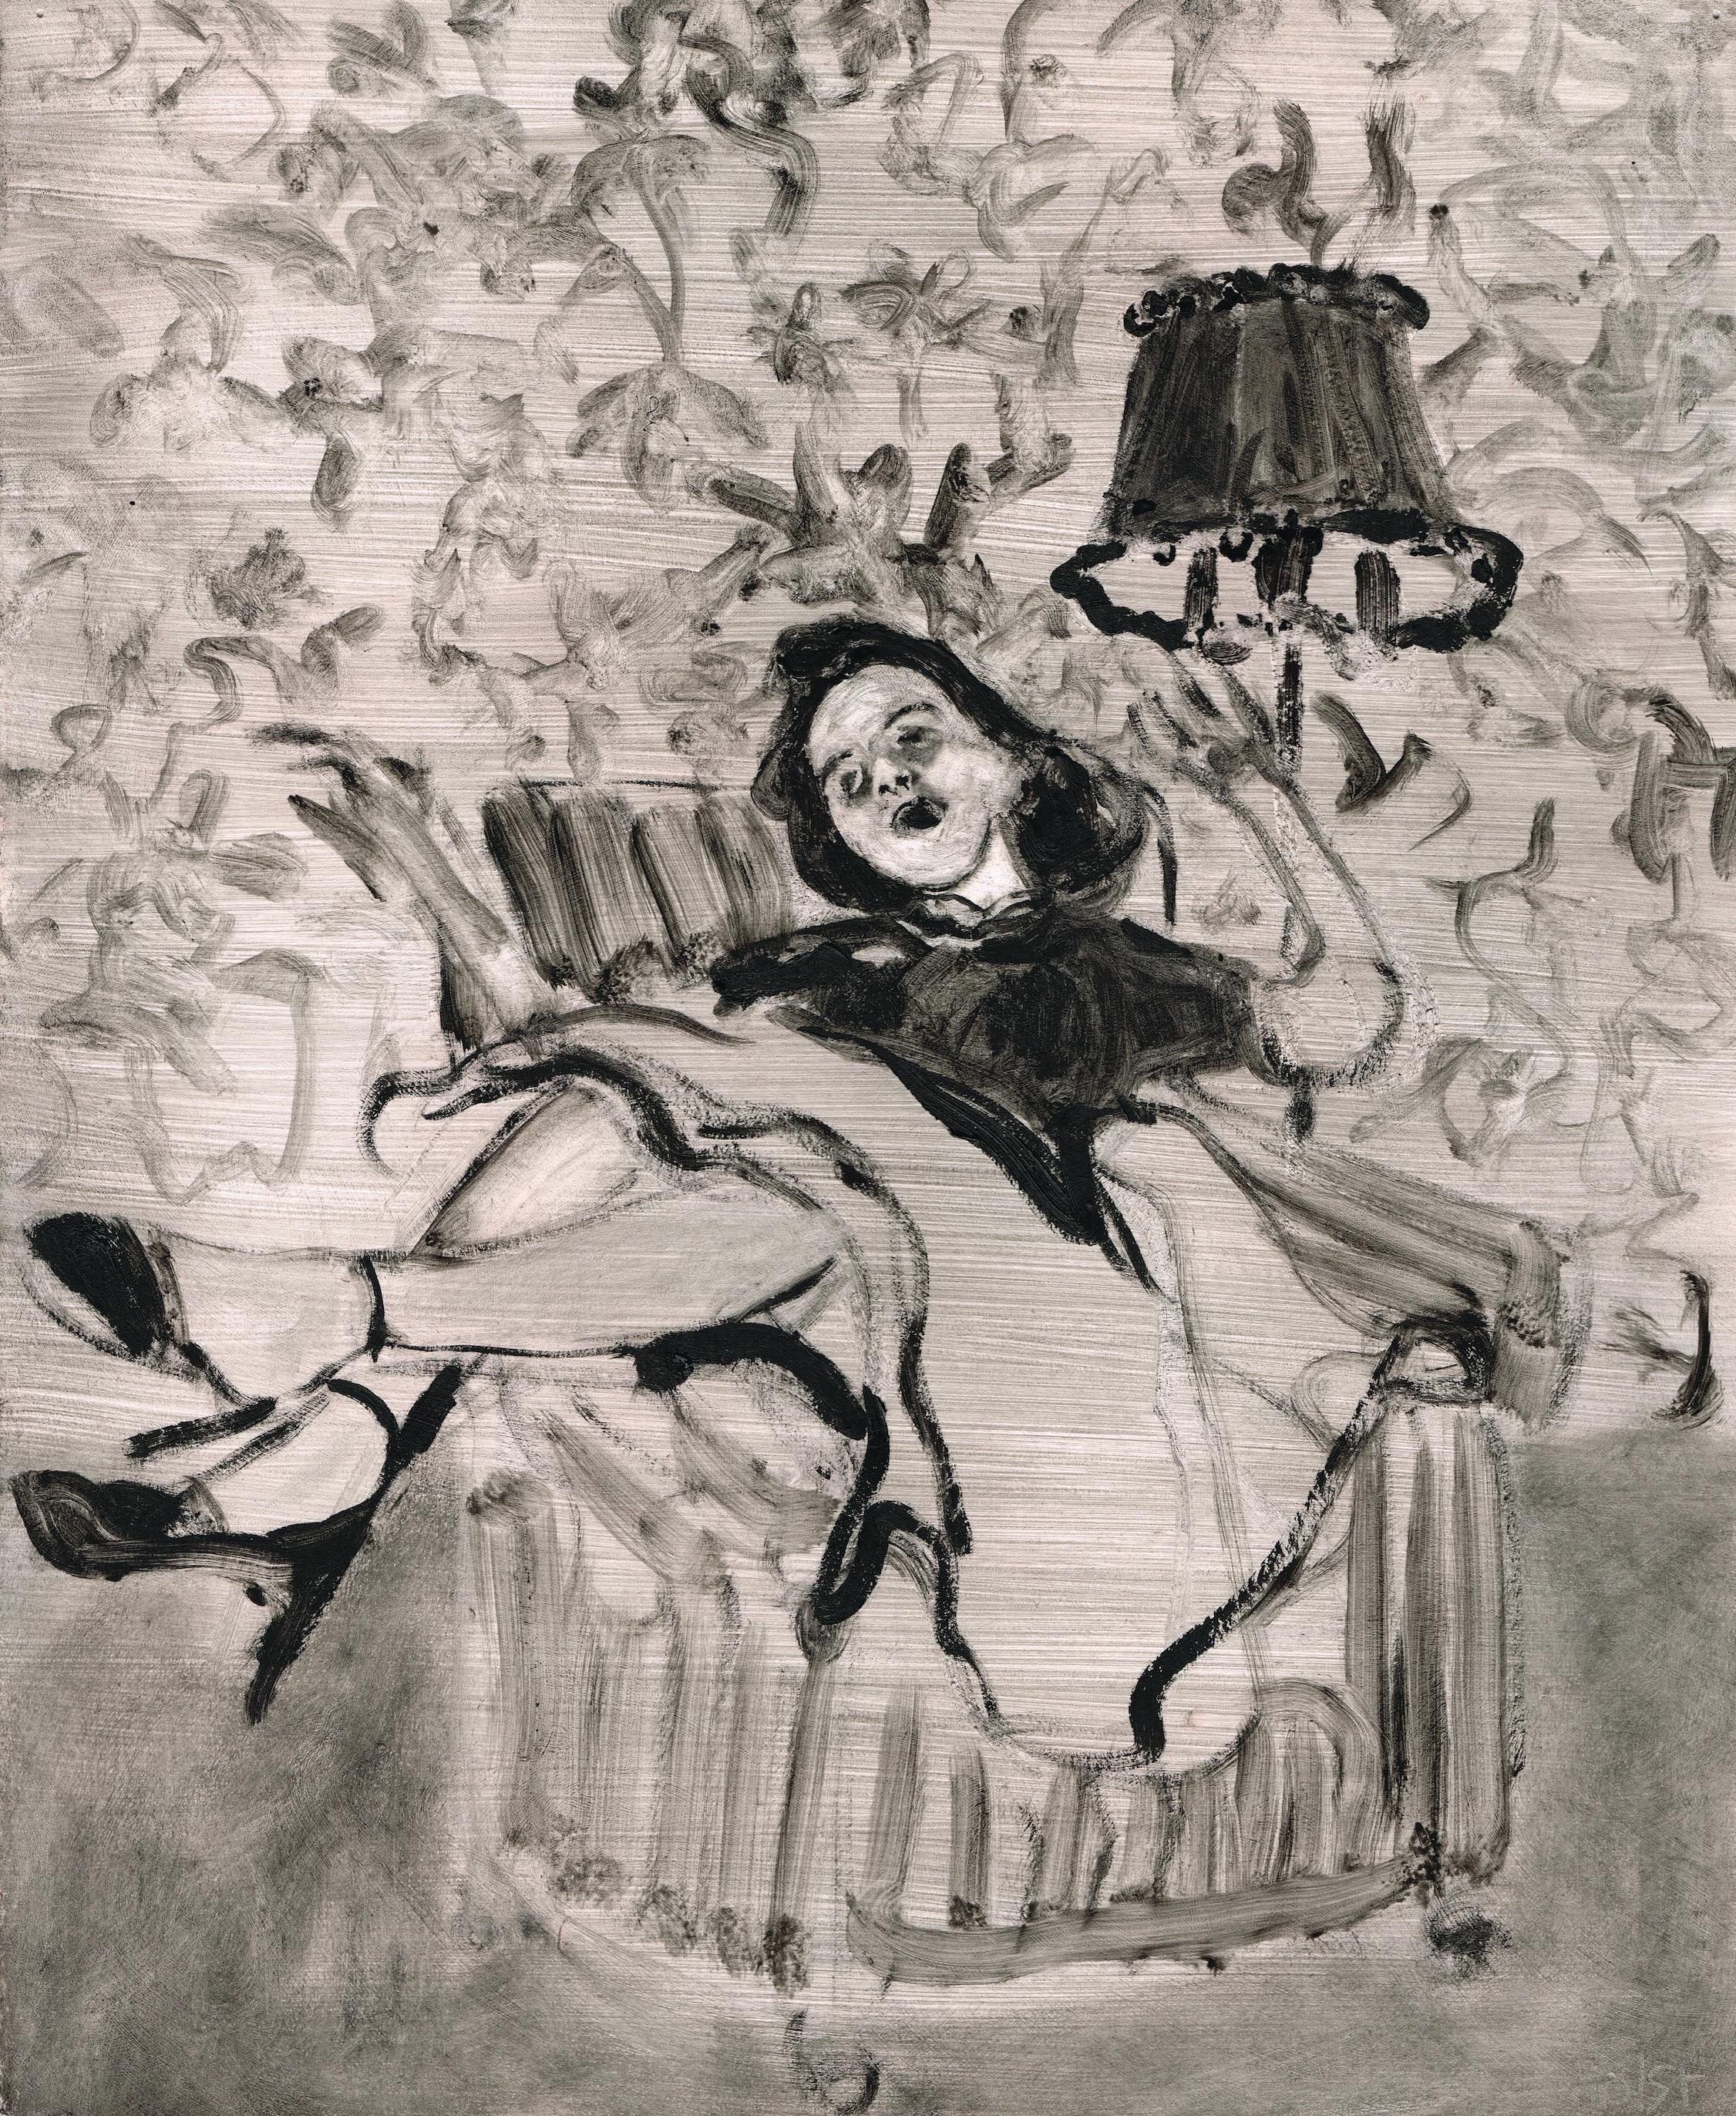 Dana Holst, Slattern, 2012, encaustic and oilstick on prepared paper, 14 x 11.5 inches.